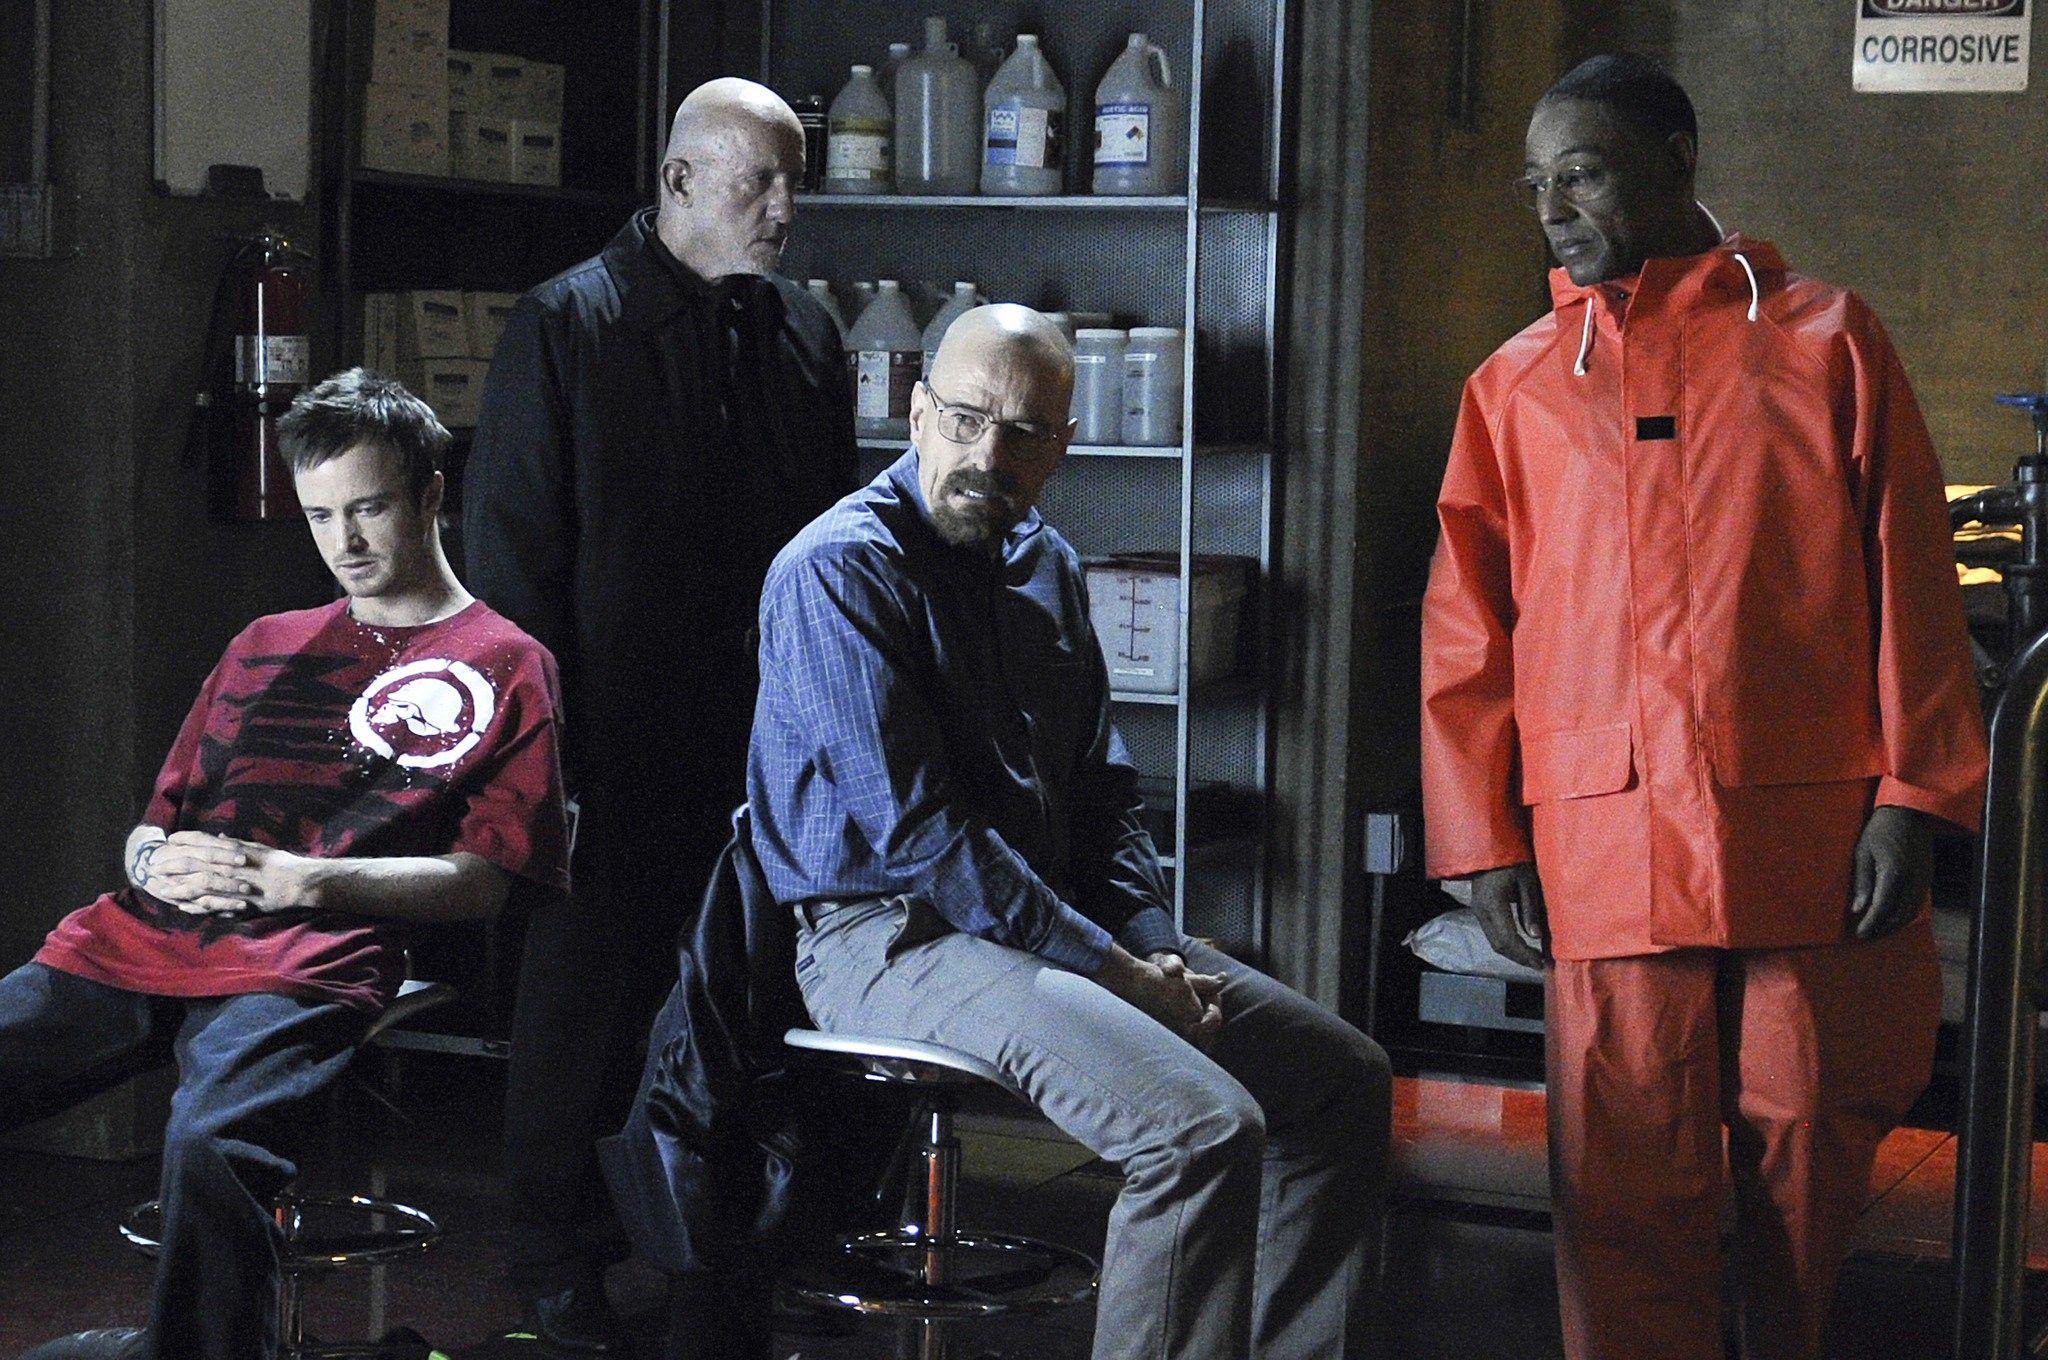 Série Breaking Bad Saison 4 En Streaming Vf Vostfr Hd Gratuitement